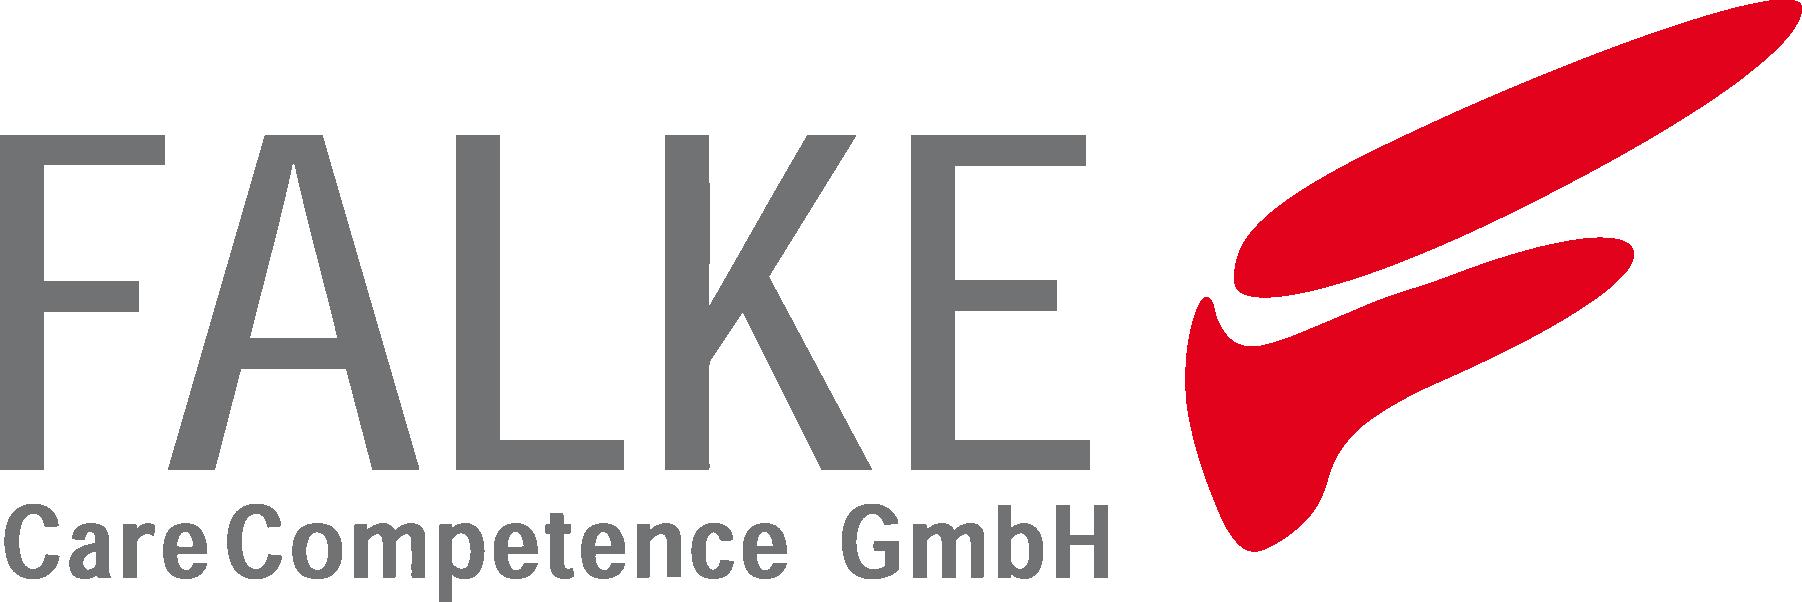 FALKE Care Competence